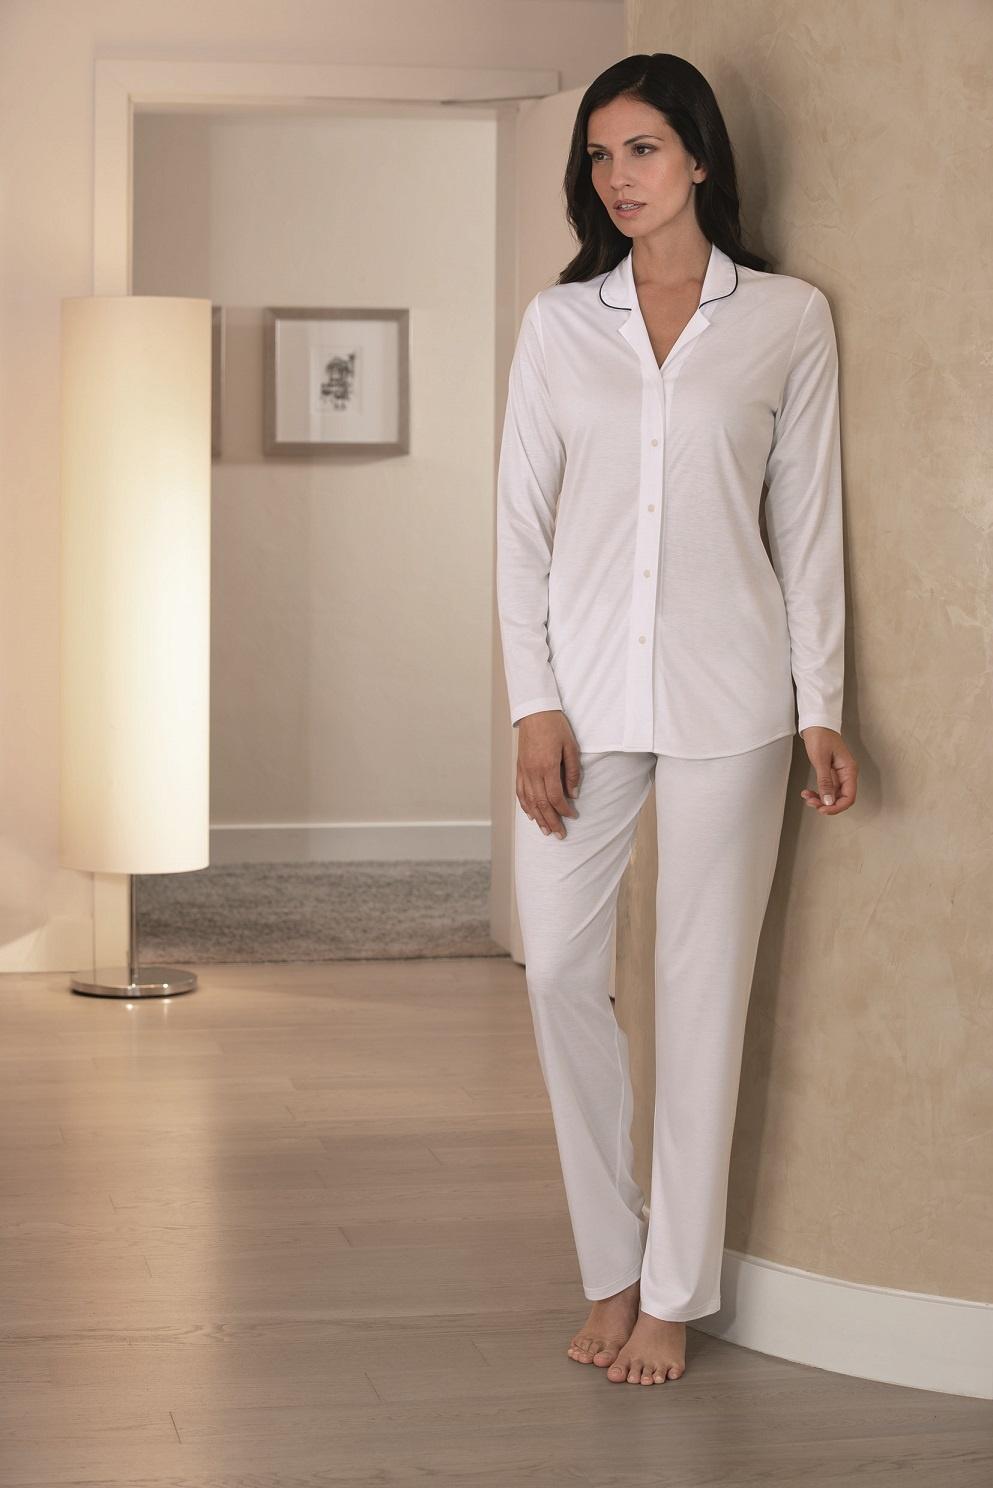 competitive price ed8af 2cf18 Novila|Damen Jersey|Schlafanzug Jersey|Textile Träume|Jersey Pyjama